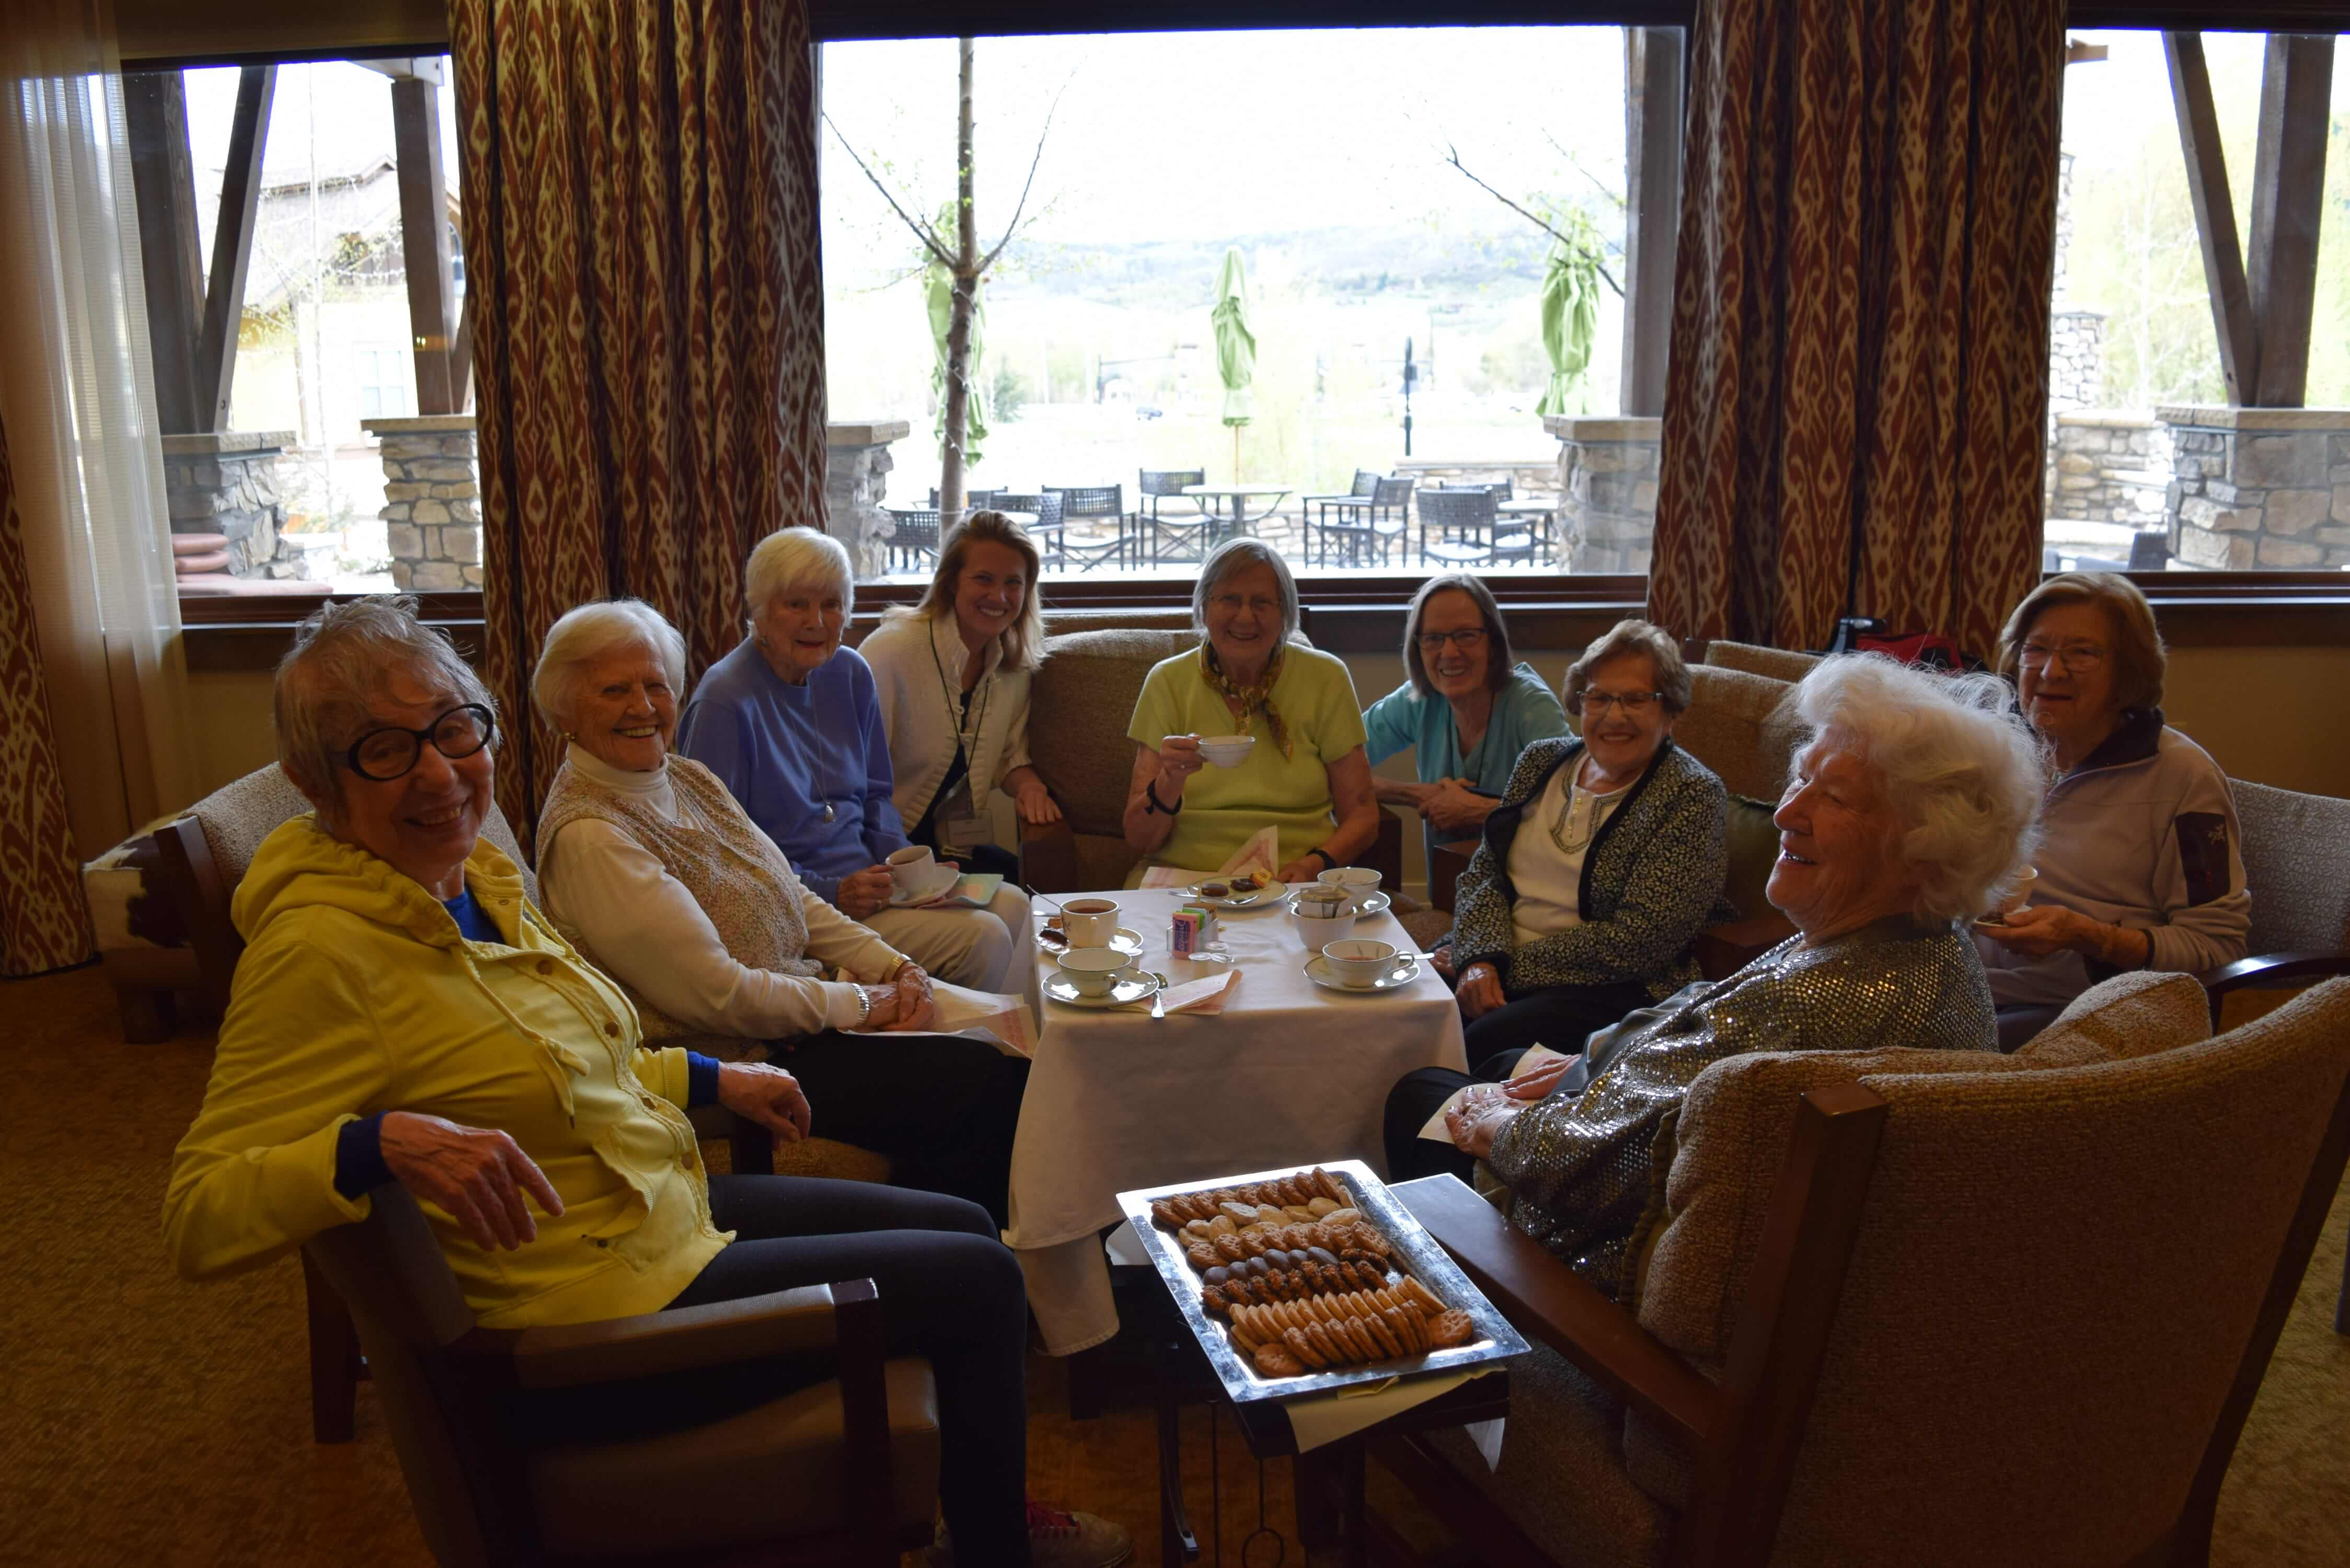 seniors talking having drinks and food